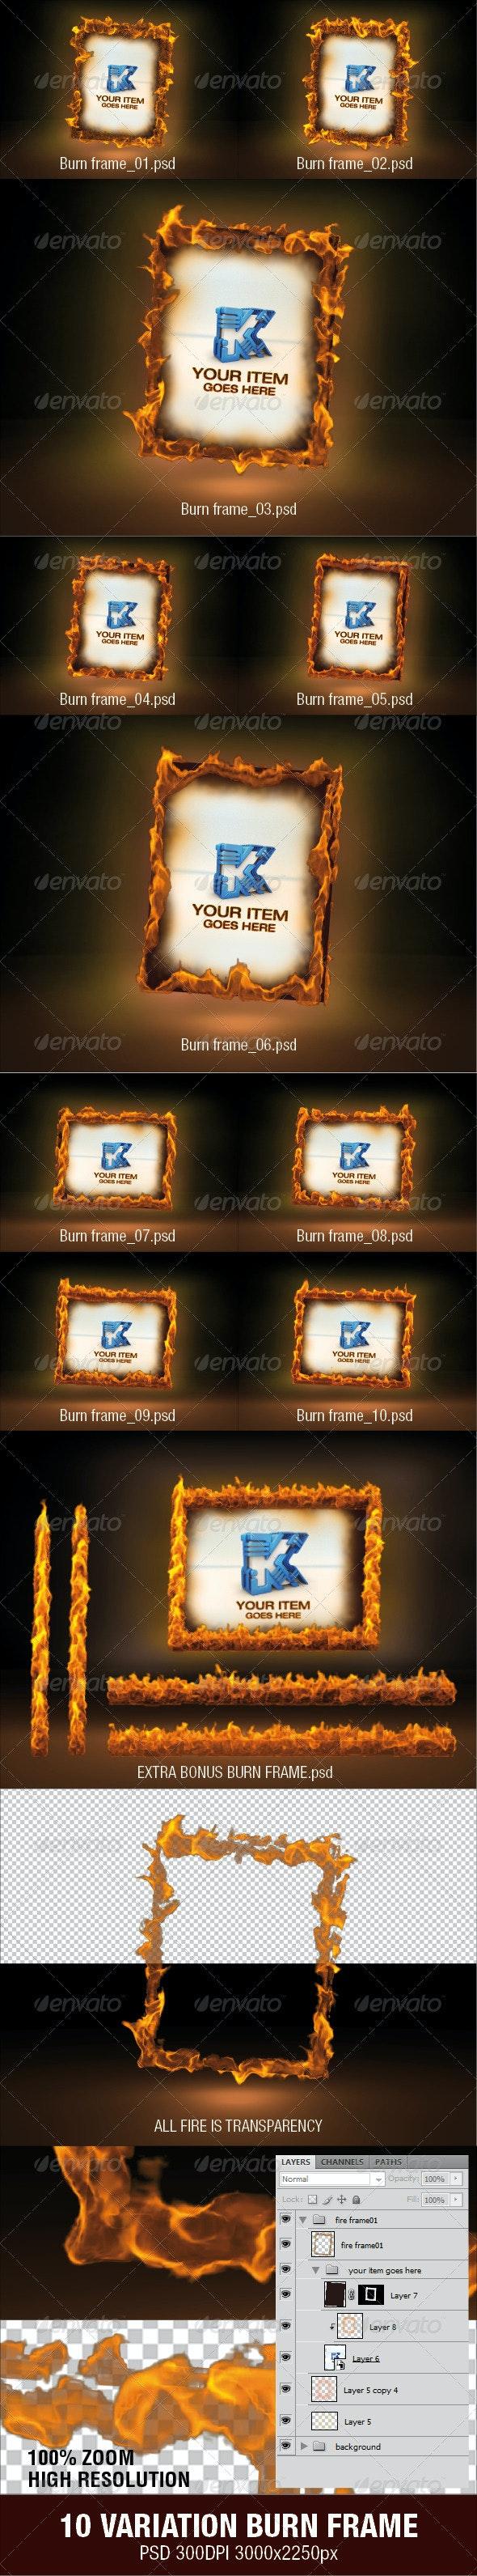 10 Variation Burn Frame - Miscellaneous Photo Templates